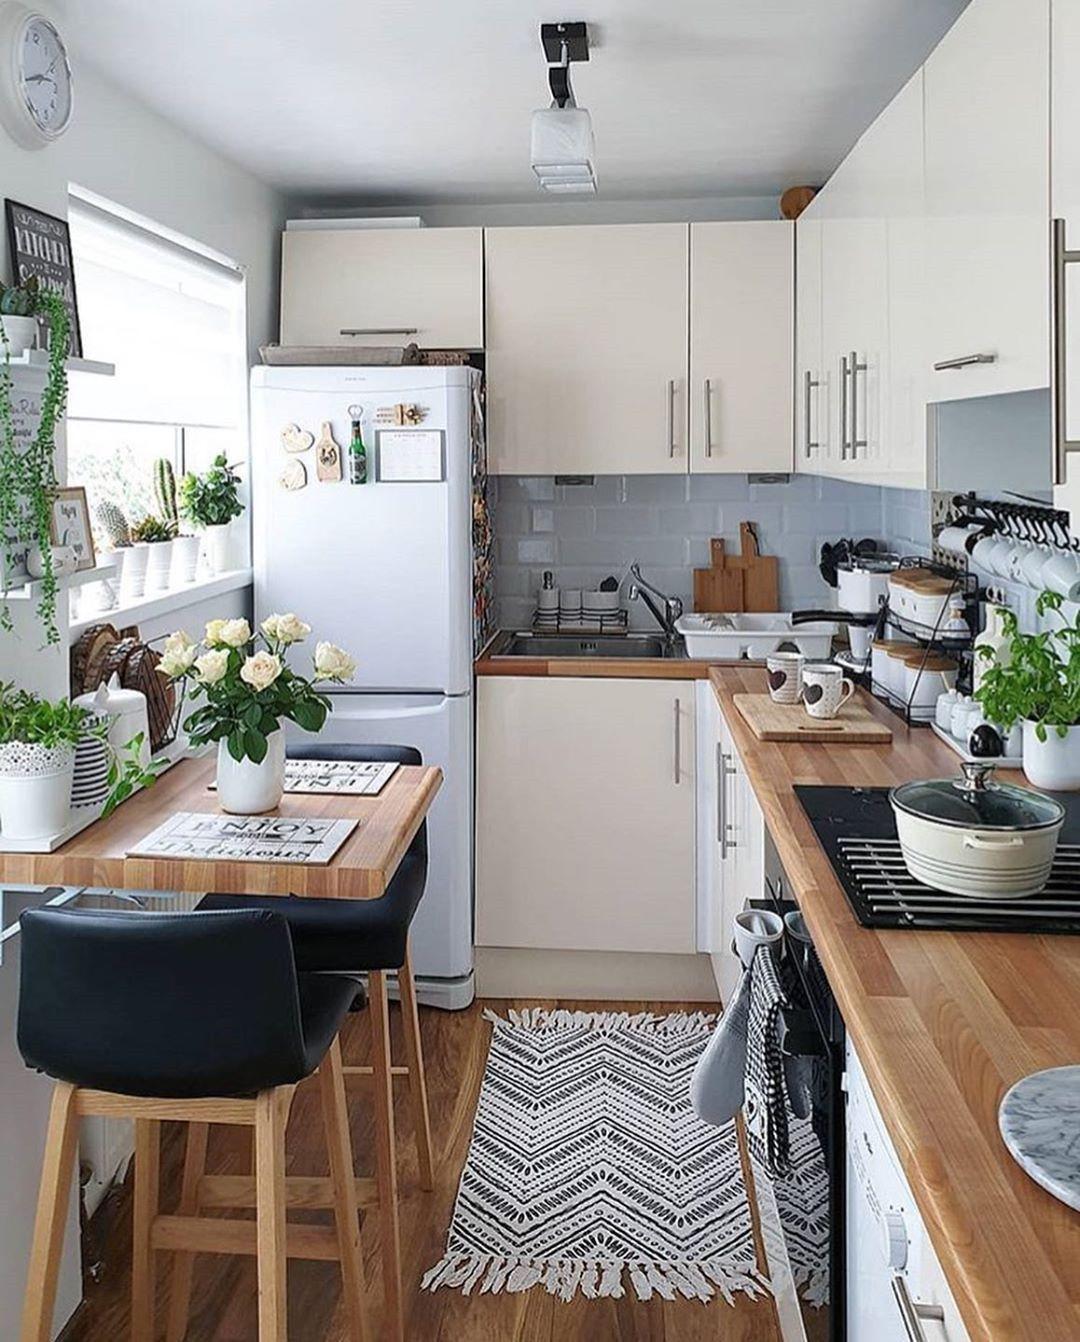 60 Creative Small Kitchen Design And Organization Ideas Small Kitchen Design Apartment Kitchen Remodel Small Kitchen Design Small